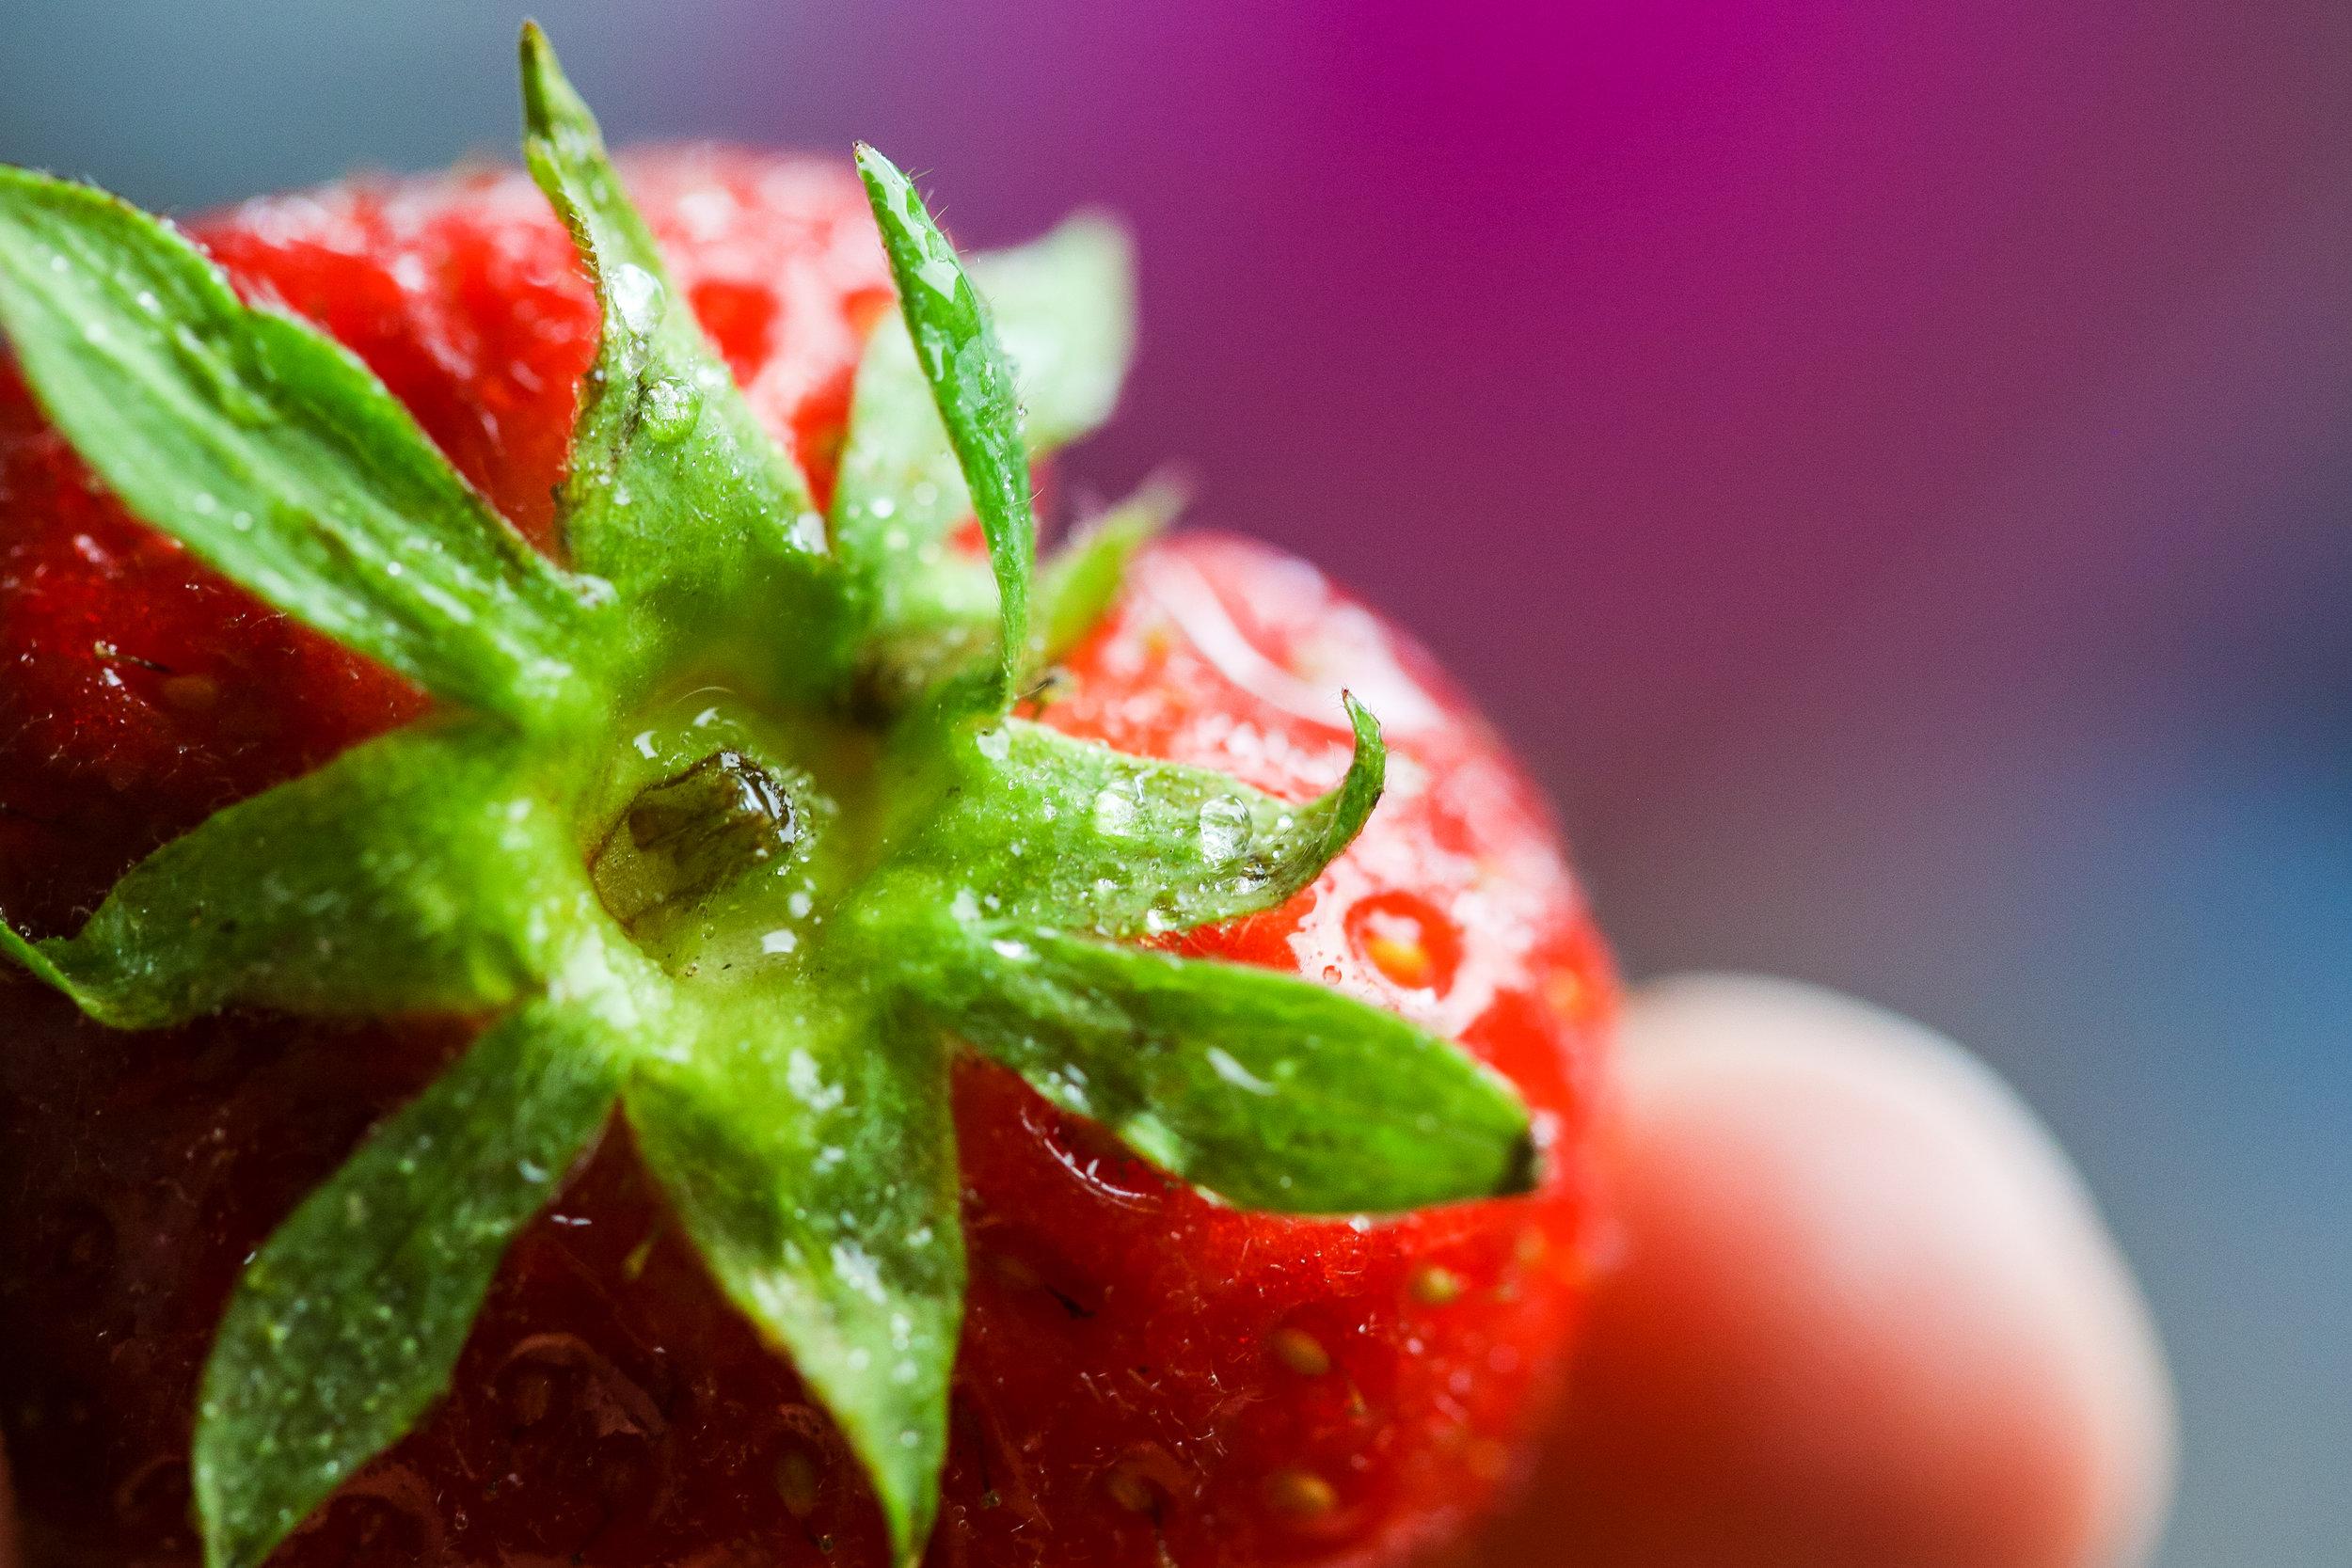 colorful-strawberry-close-up-picjumbo-com.jpg